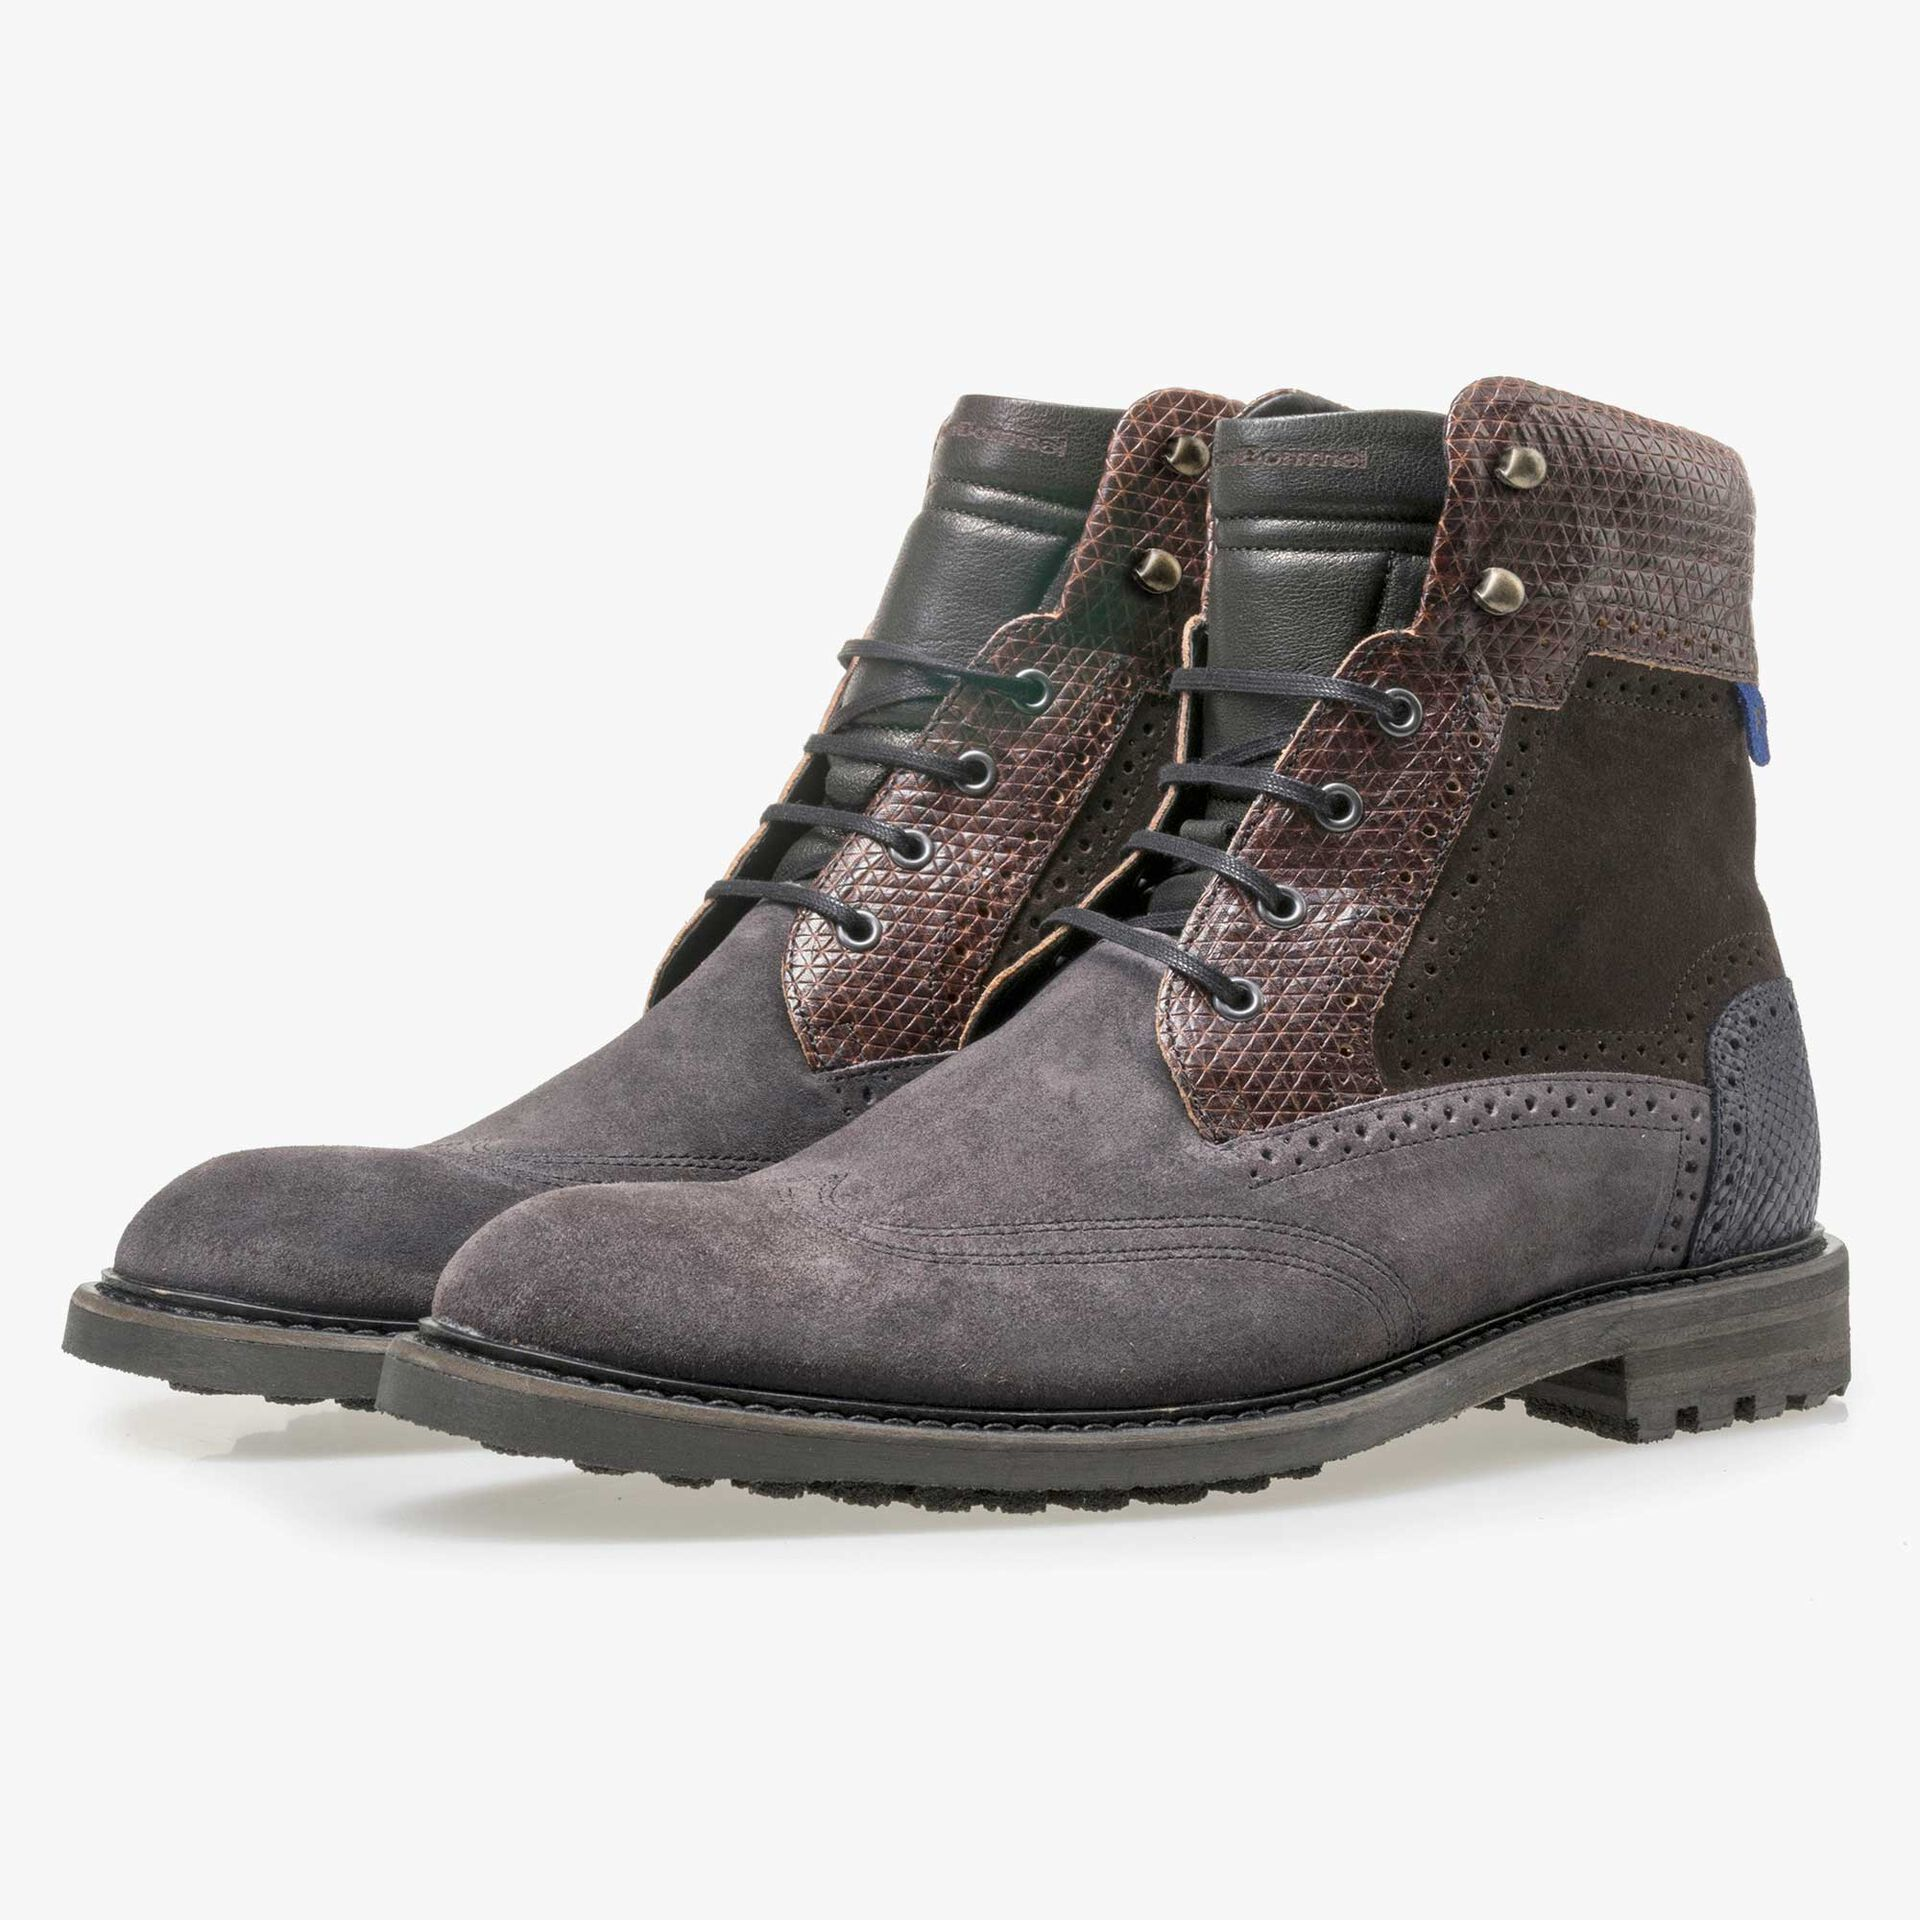 Floris van Bommel dark grey high suede leather lace boot